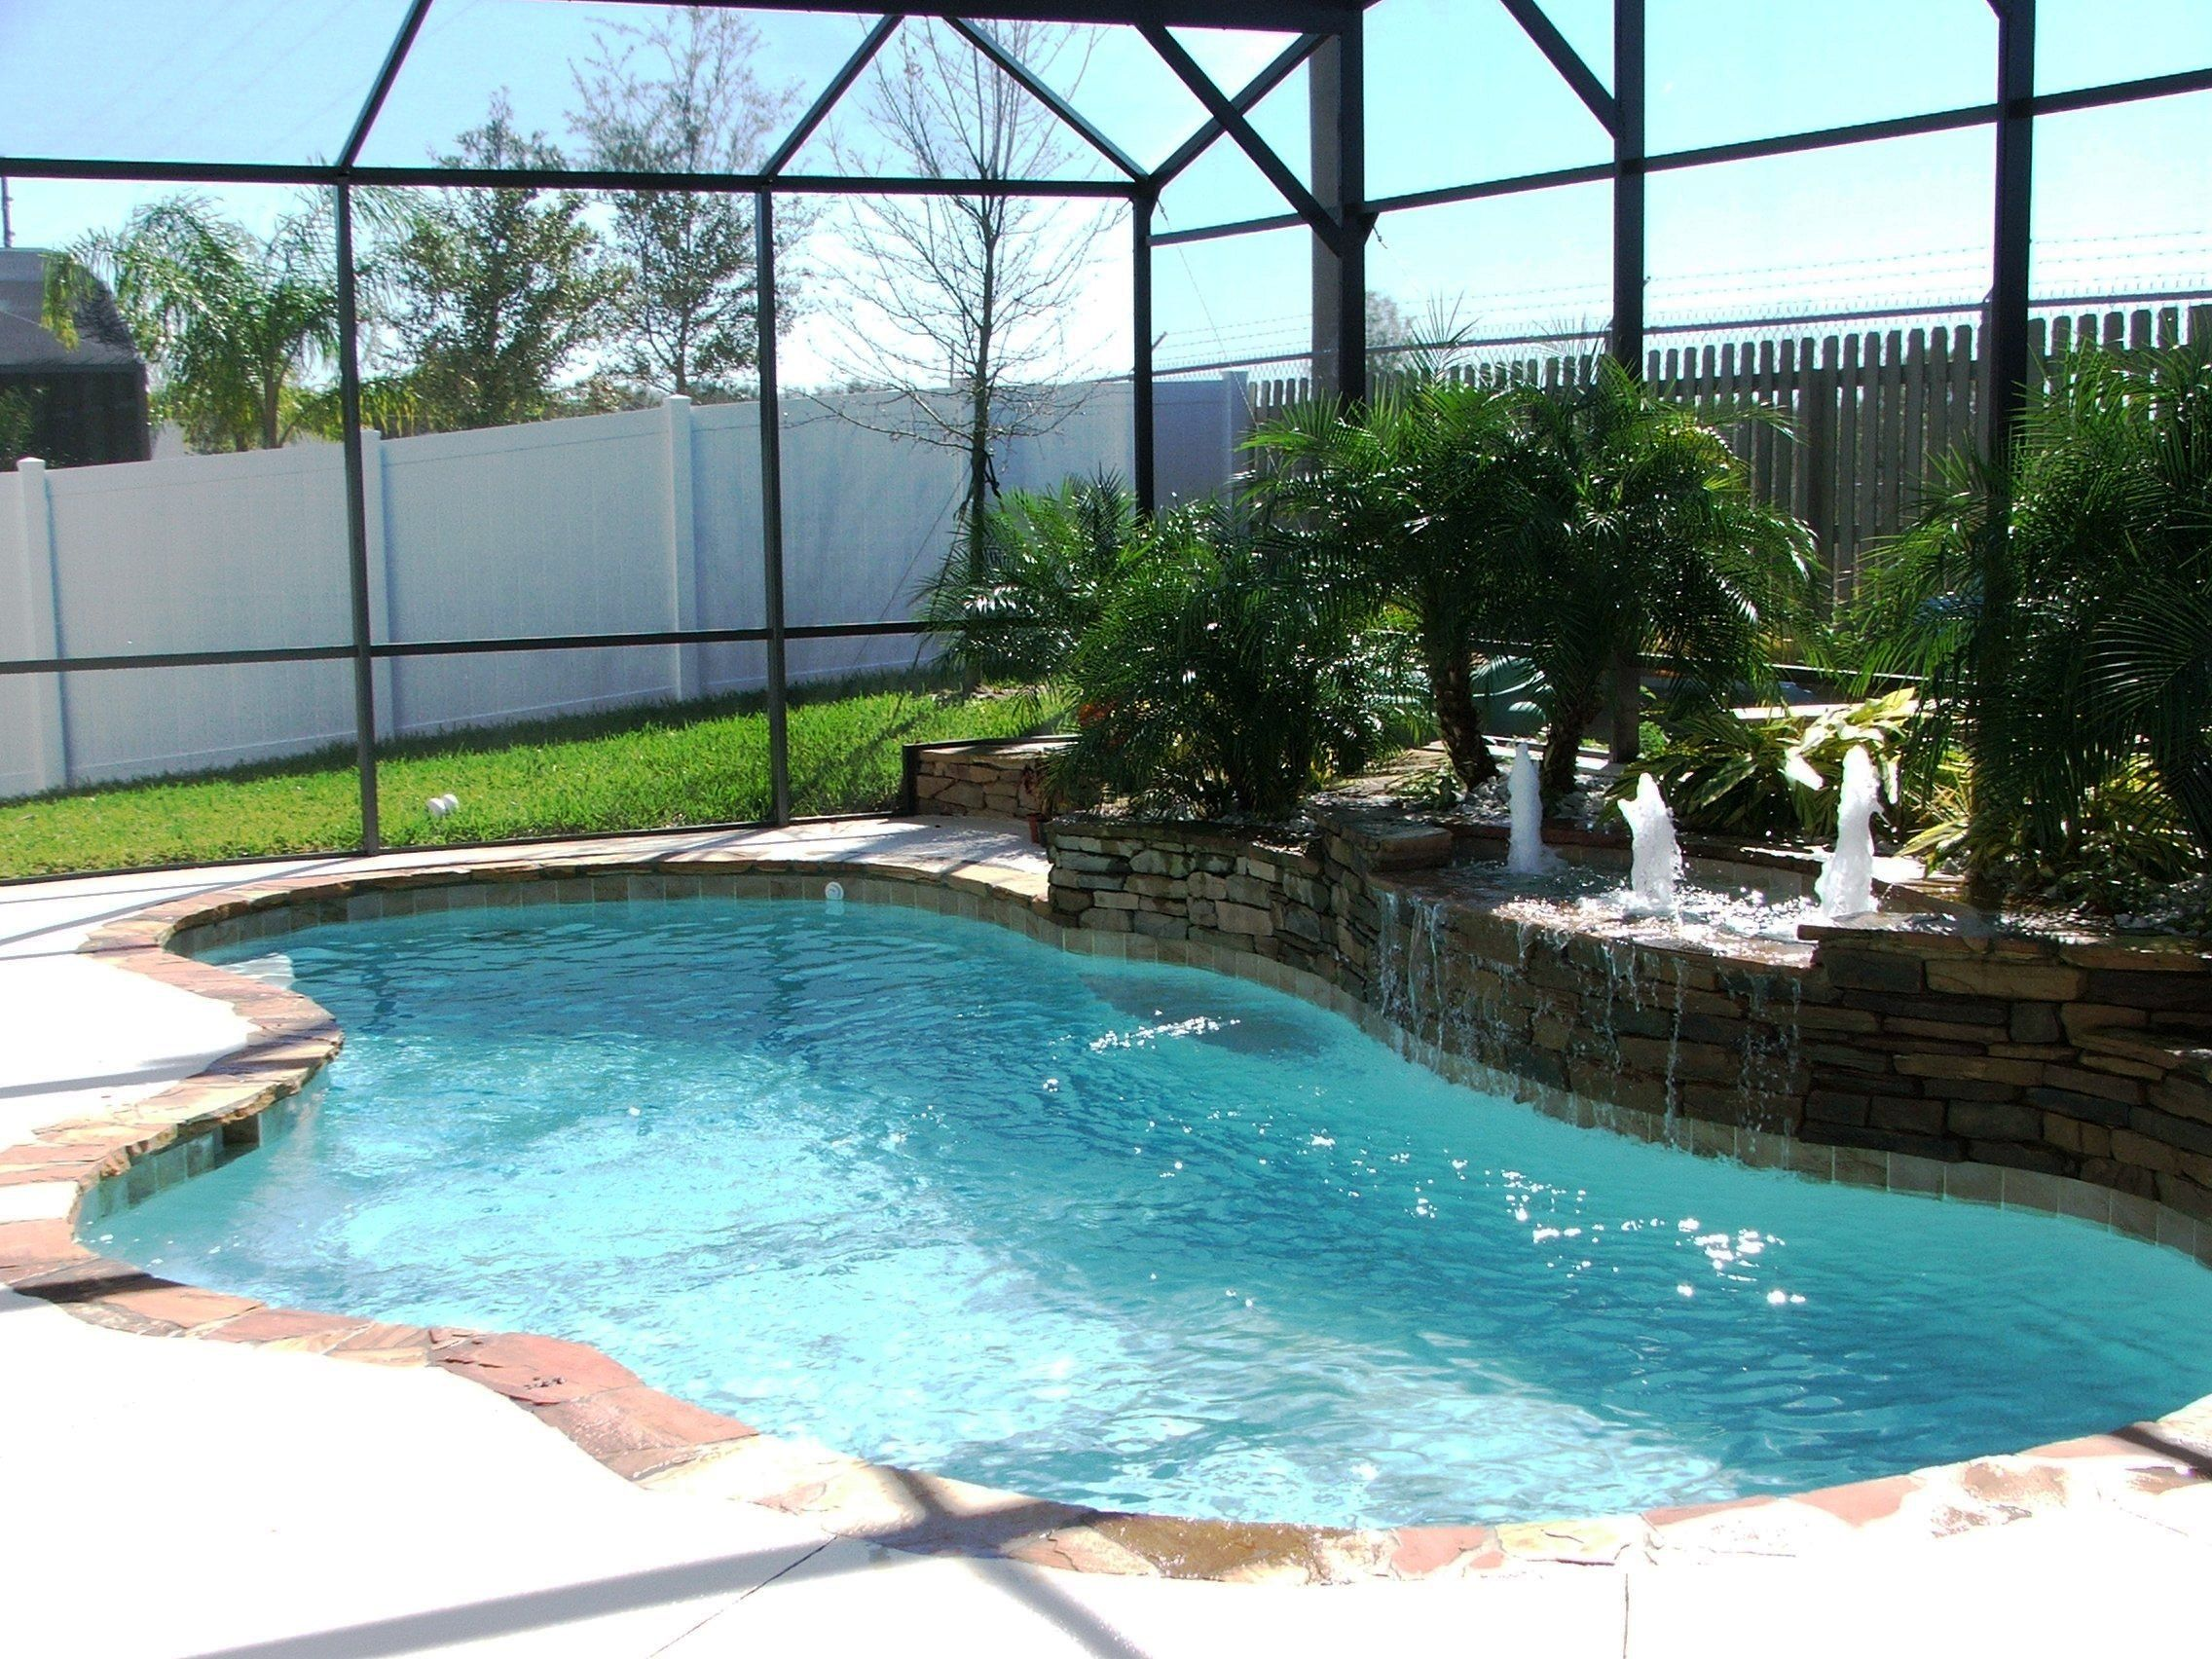 Pin By Geri Blasse On Pool Concepts Garden Pool Pool Landscaping Pool